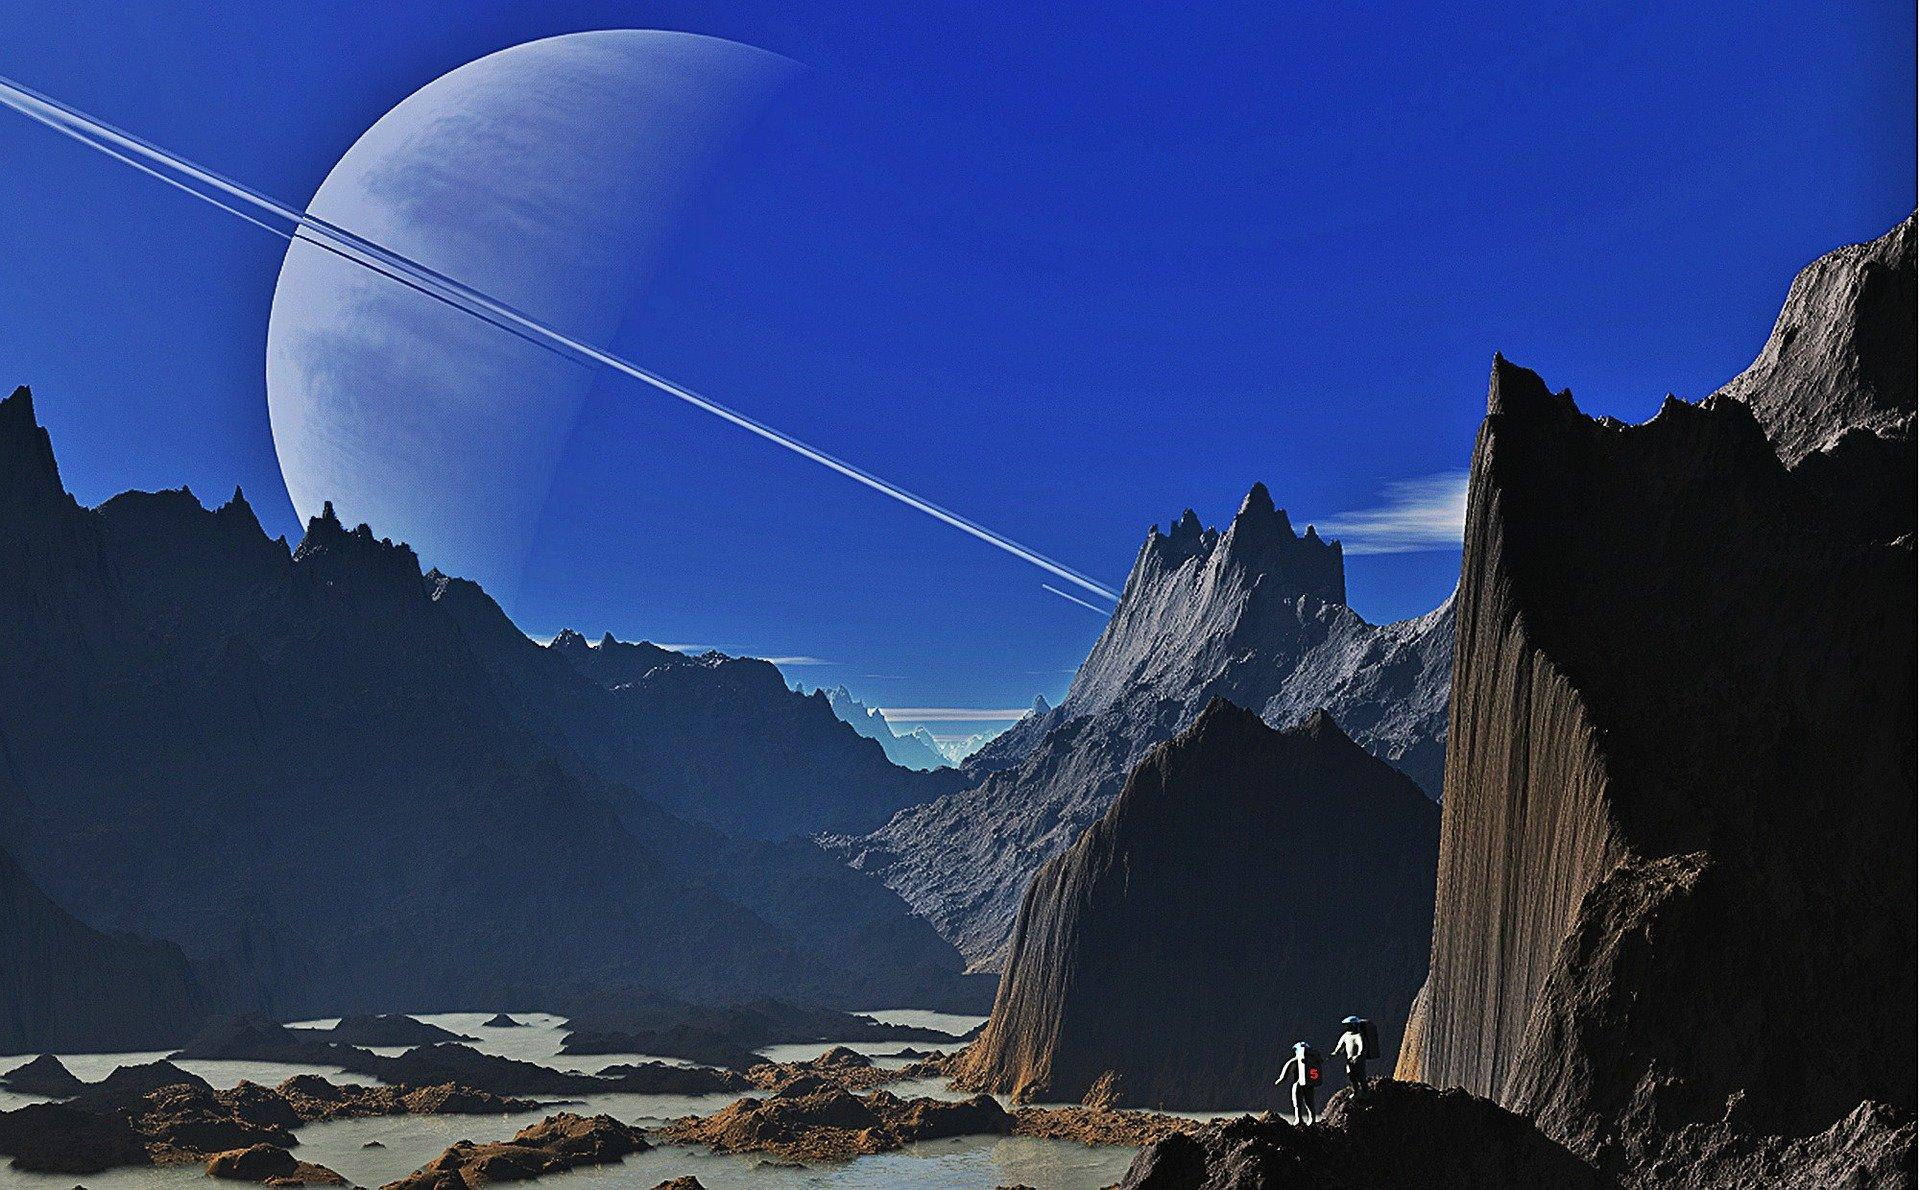 Image of two spacemen on rocky terrain, overlooking Saturn